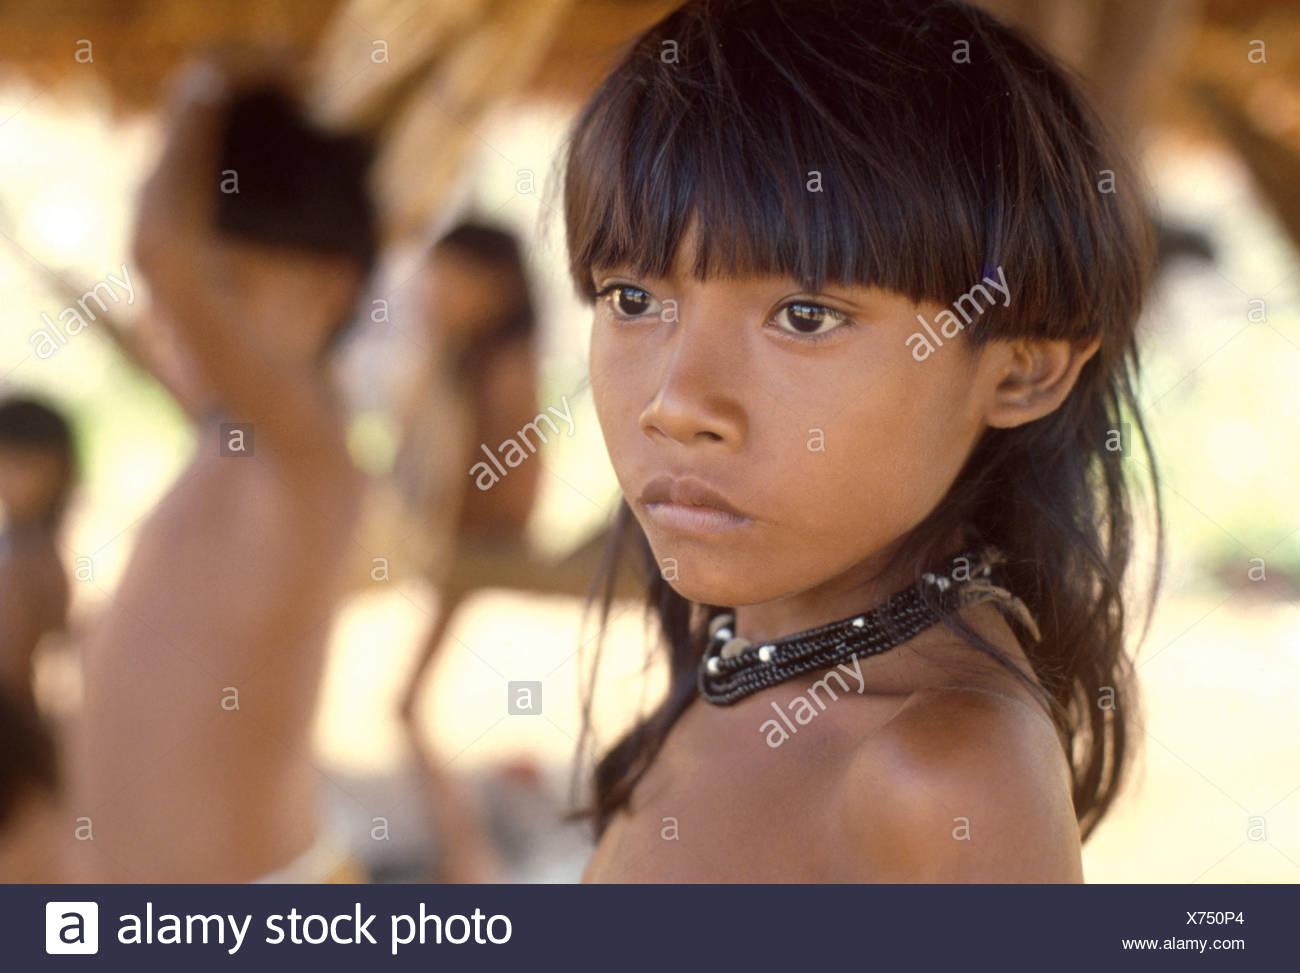 Zoro indigenous people, Brazil. - Stock Image